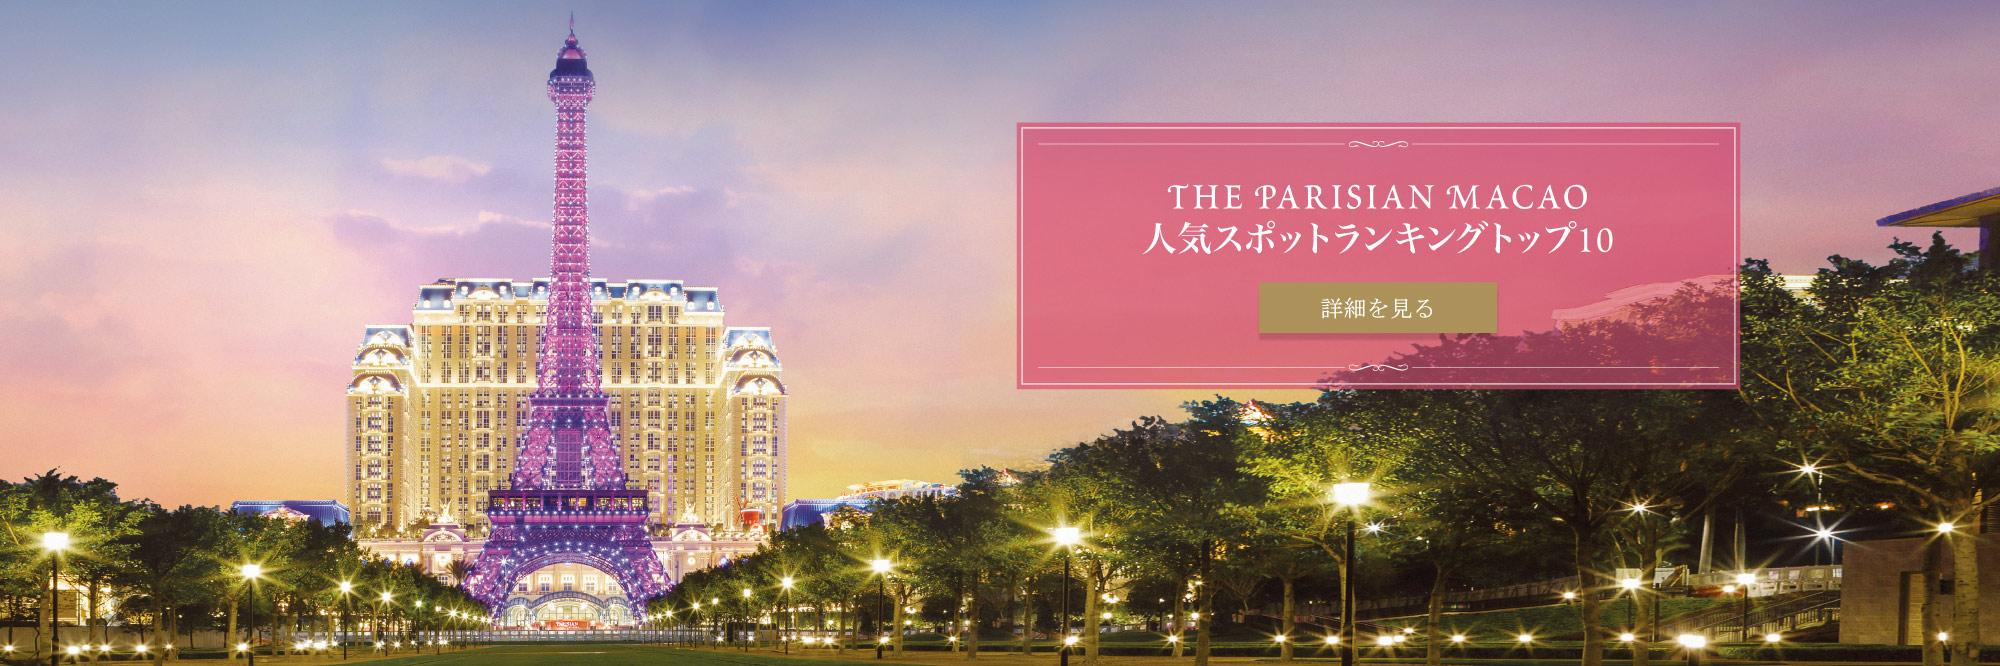 The Parisian Macao人気スポットランキングトップ10